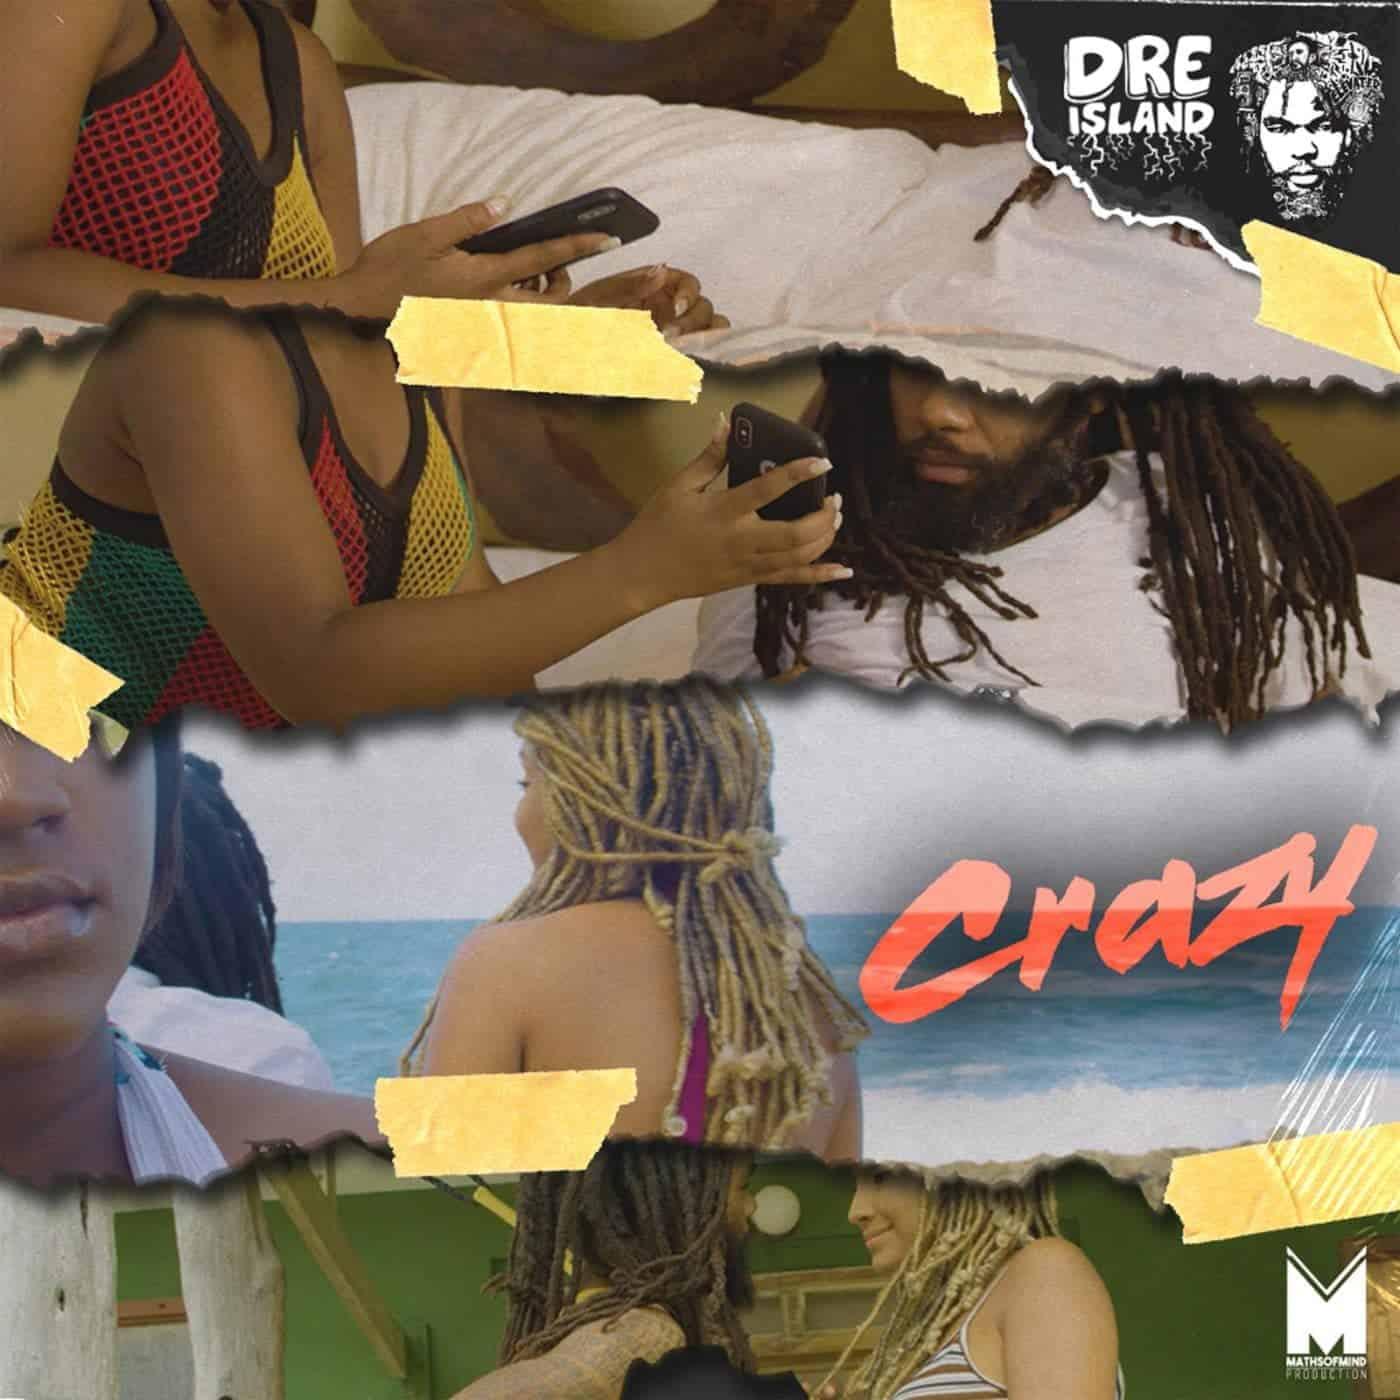 Dre Island - Crazy - MathsOfMind Production - VPAL Music